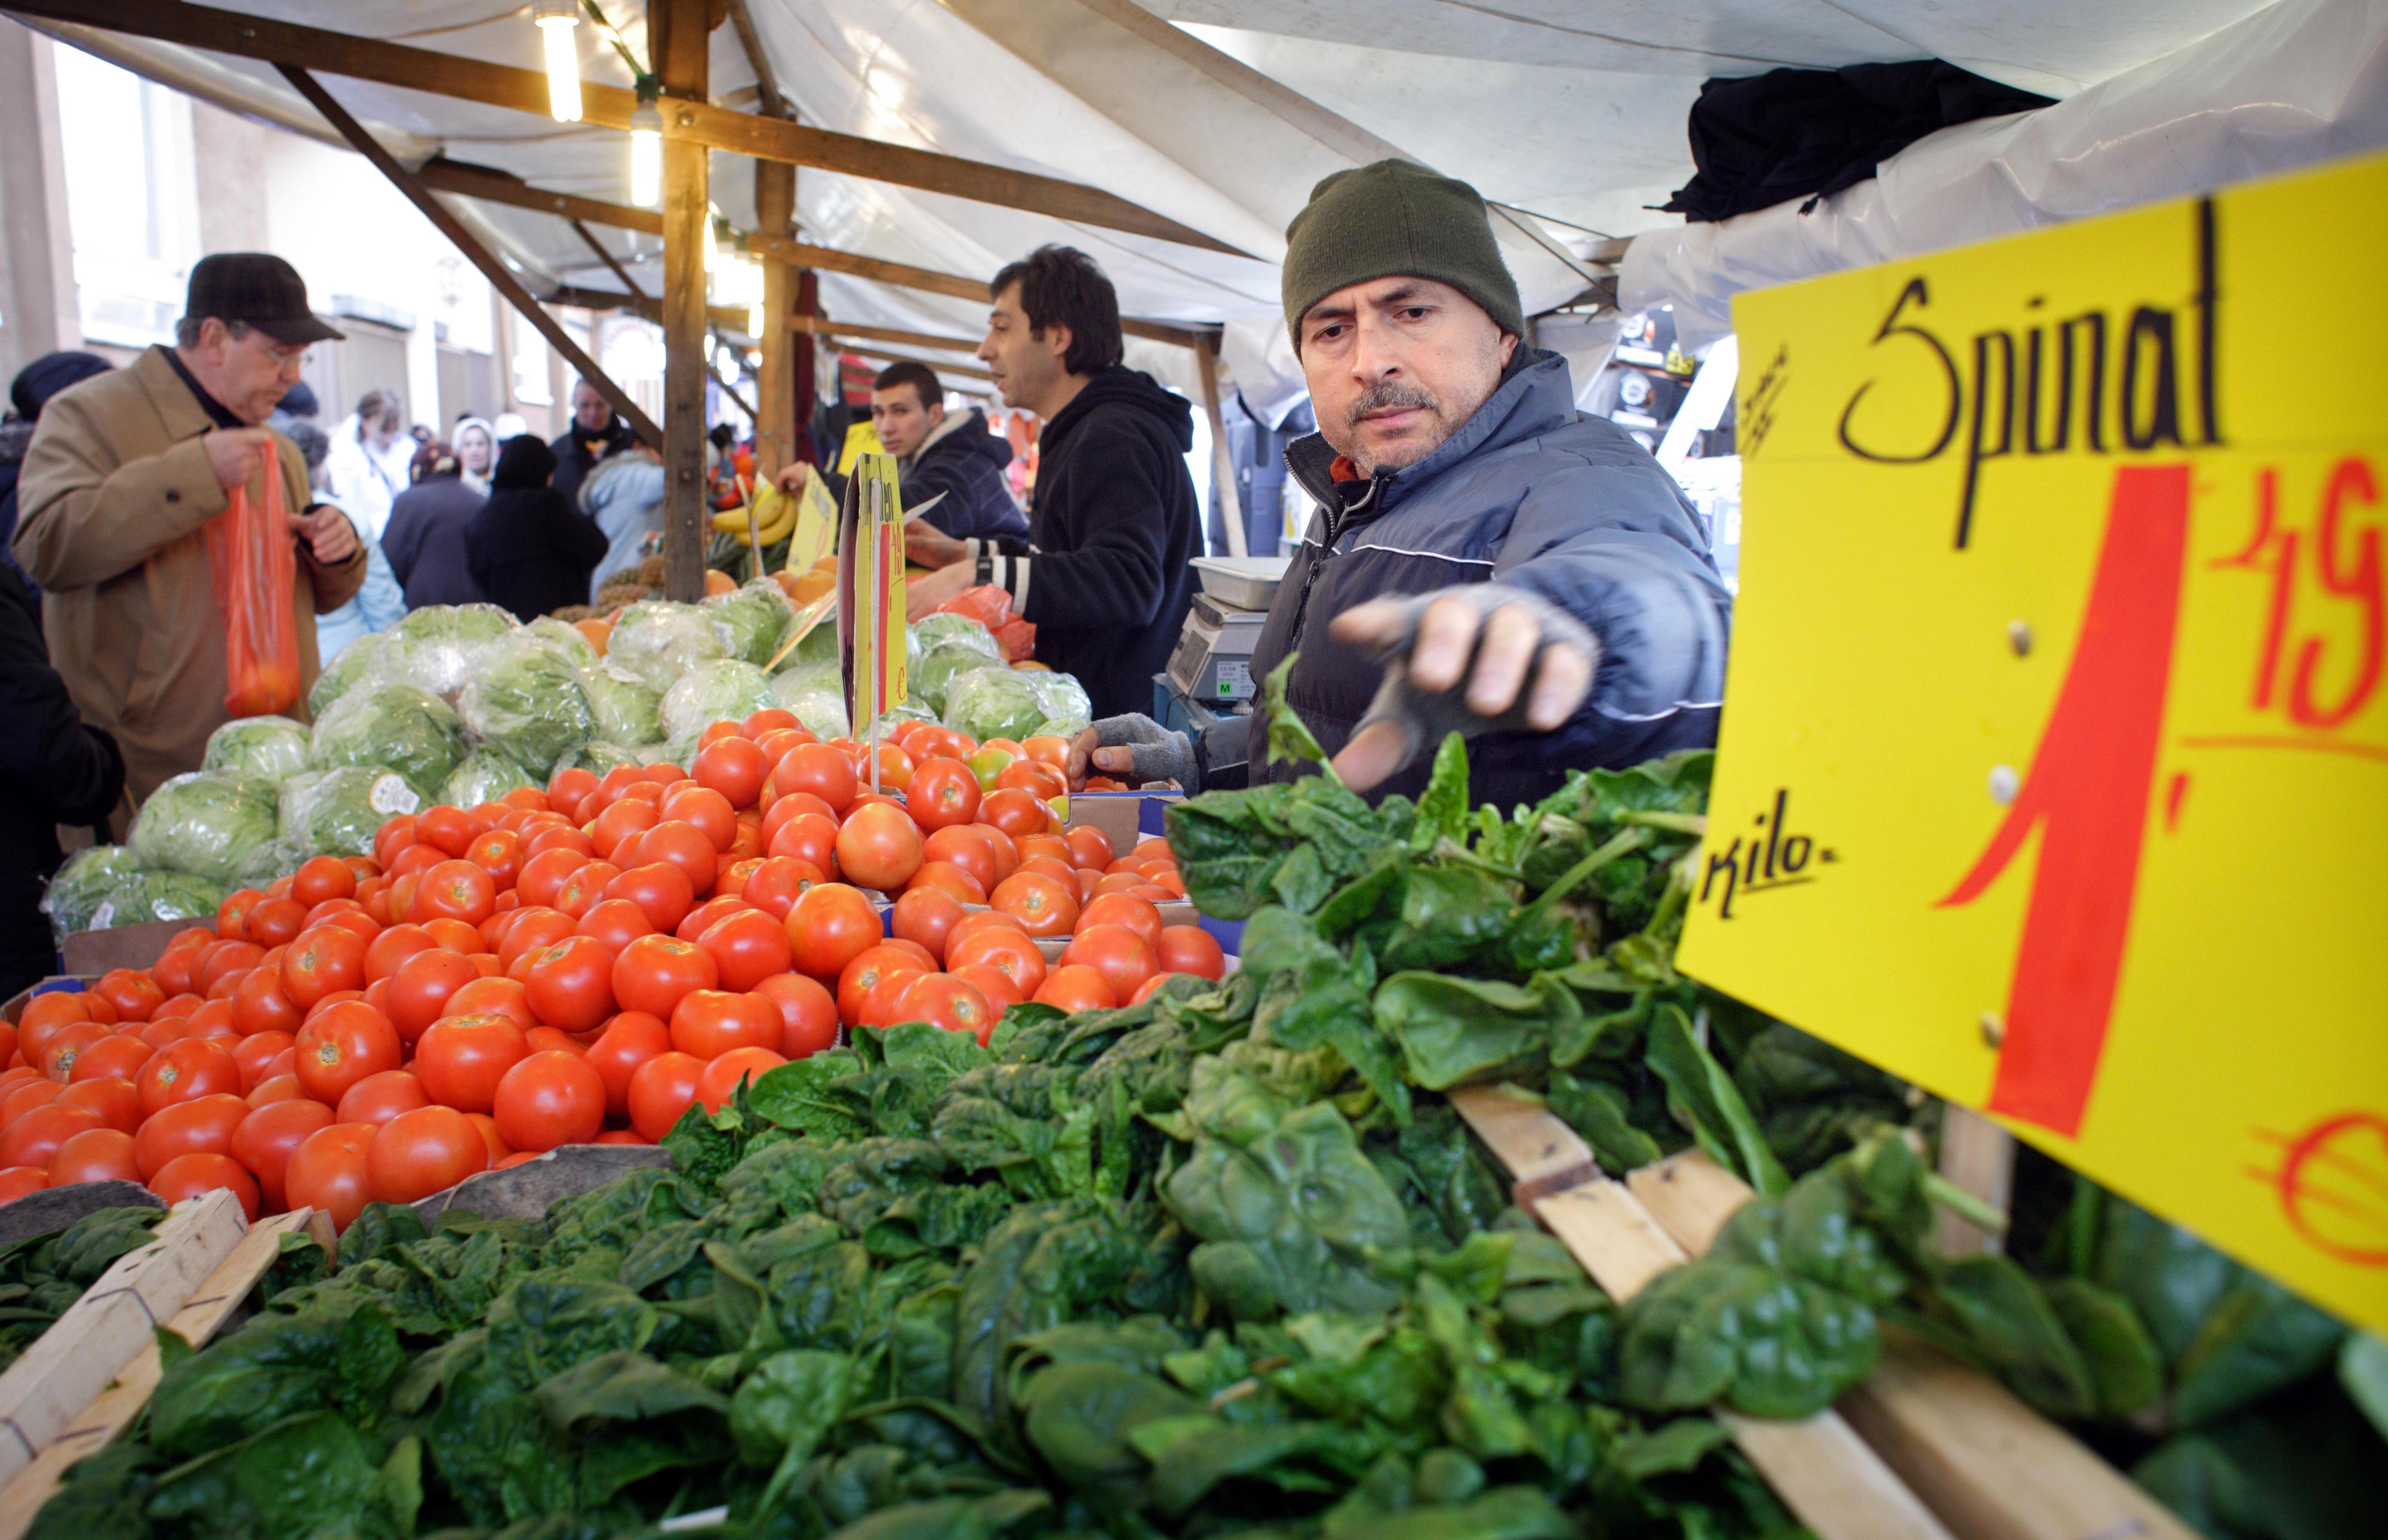 Wochenmarkt in Berlin-Neukölln